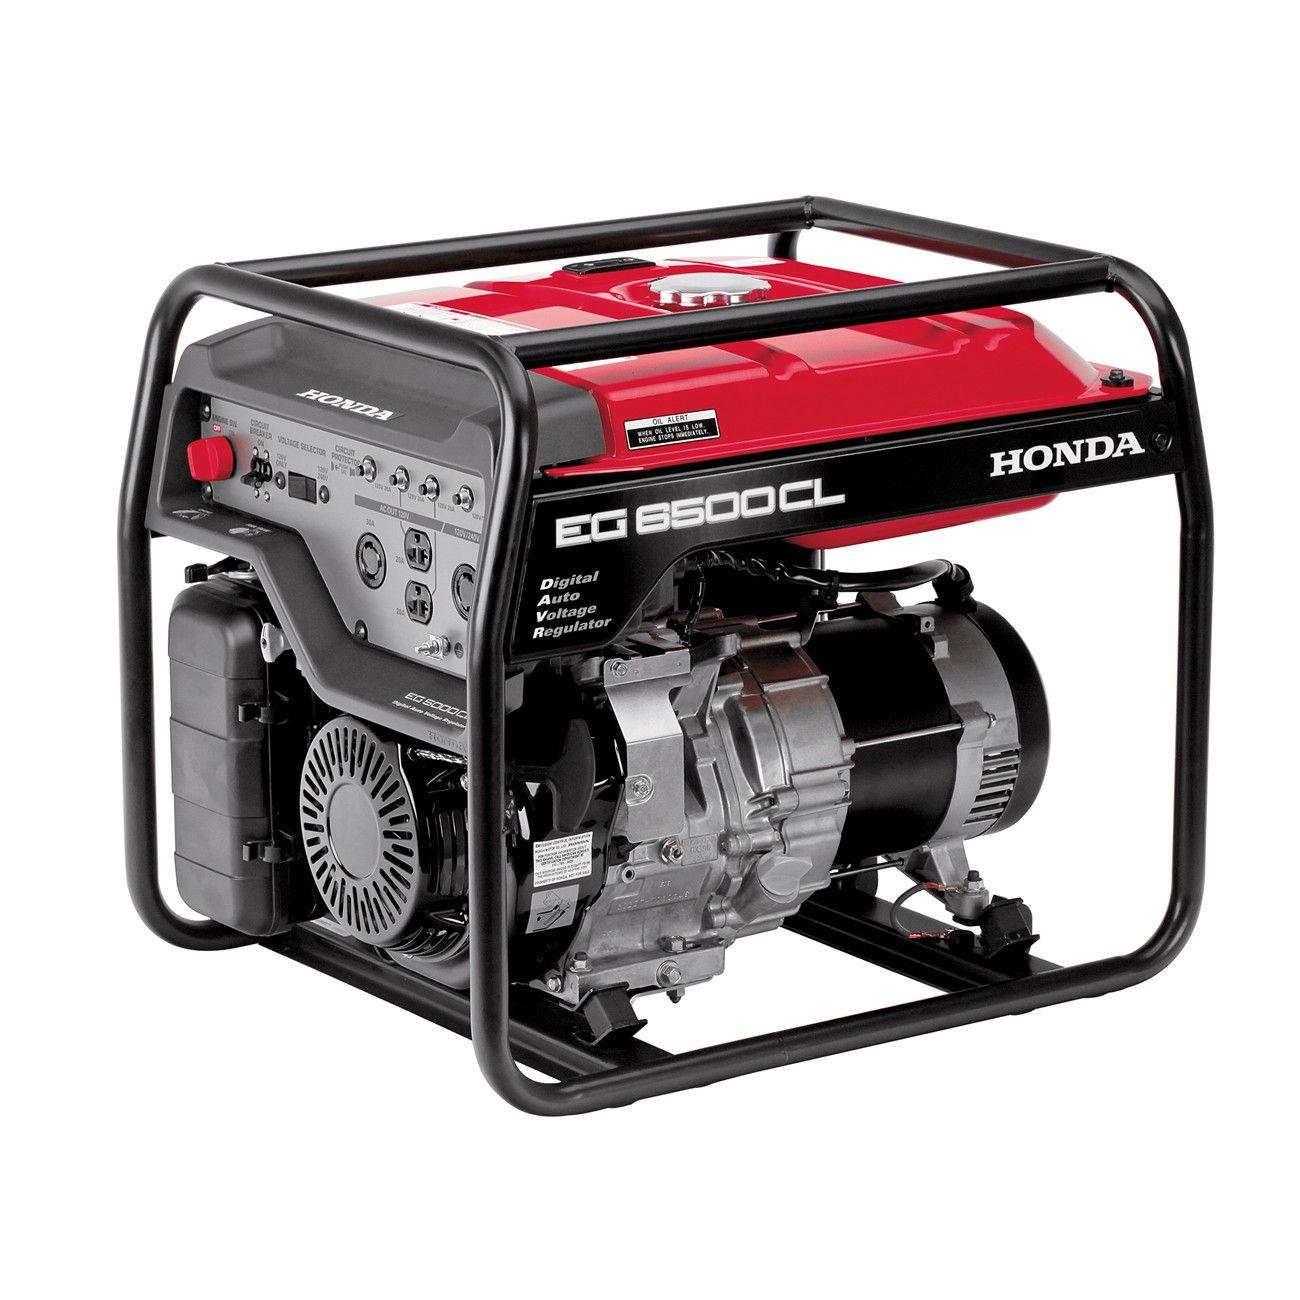 Honda Generator EG6500 Economy Series Honda generator